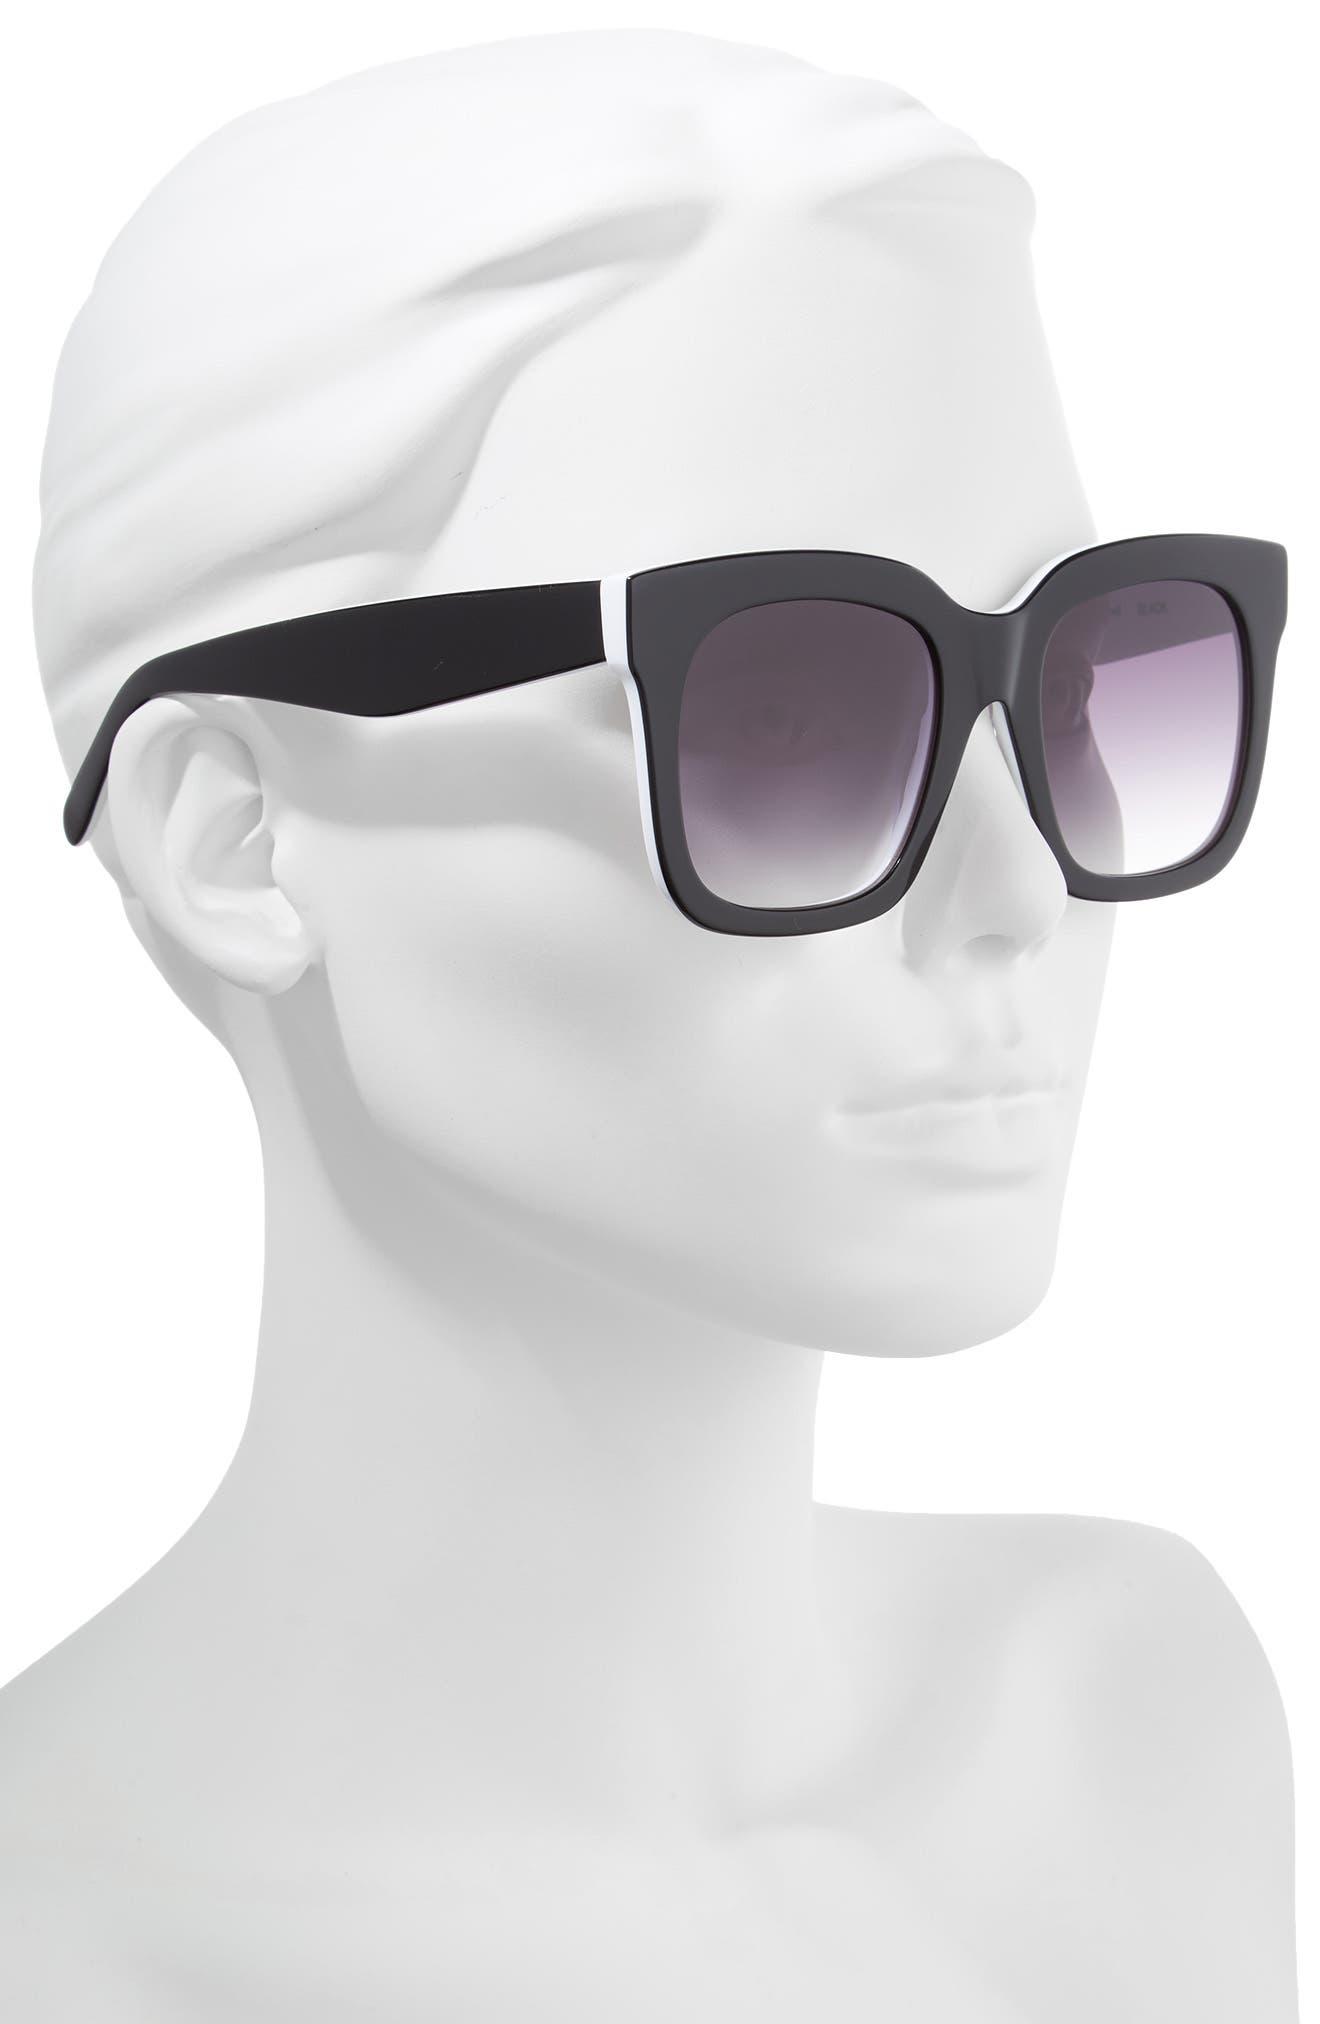 Coco 52mm Sunglasses,                             Alternate thumbnail 2, color,                             BLACK